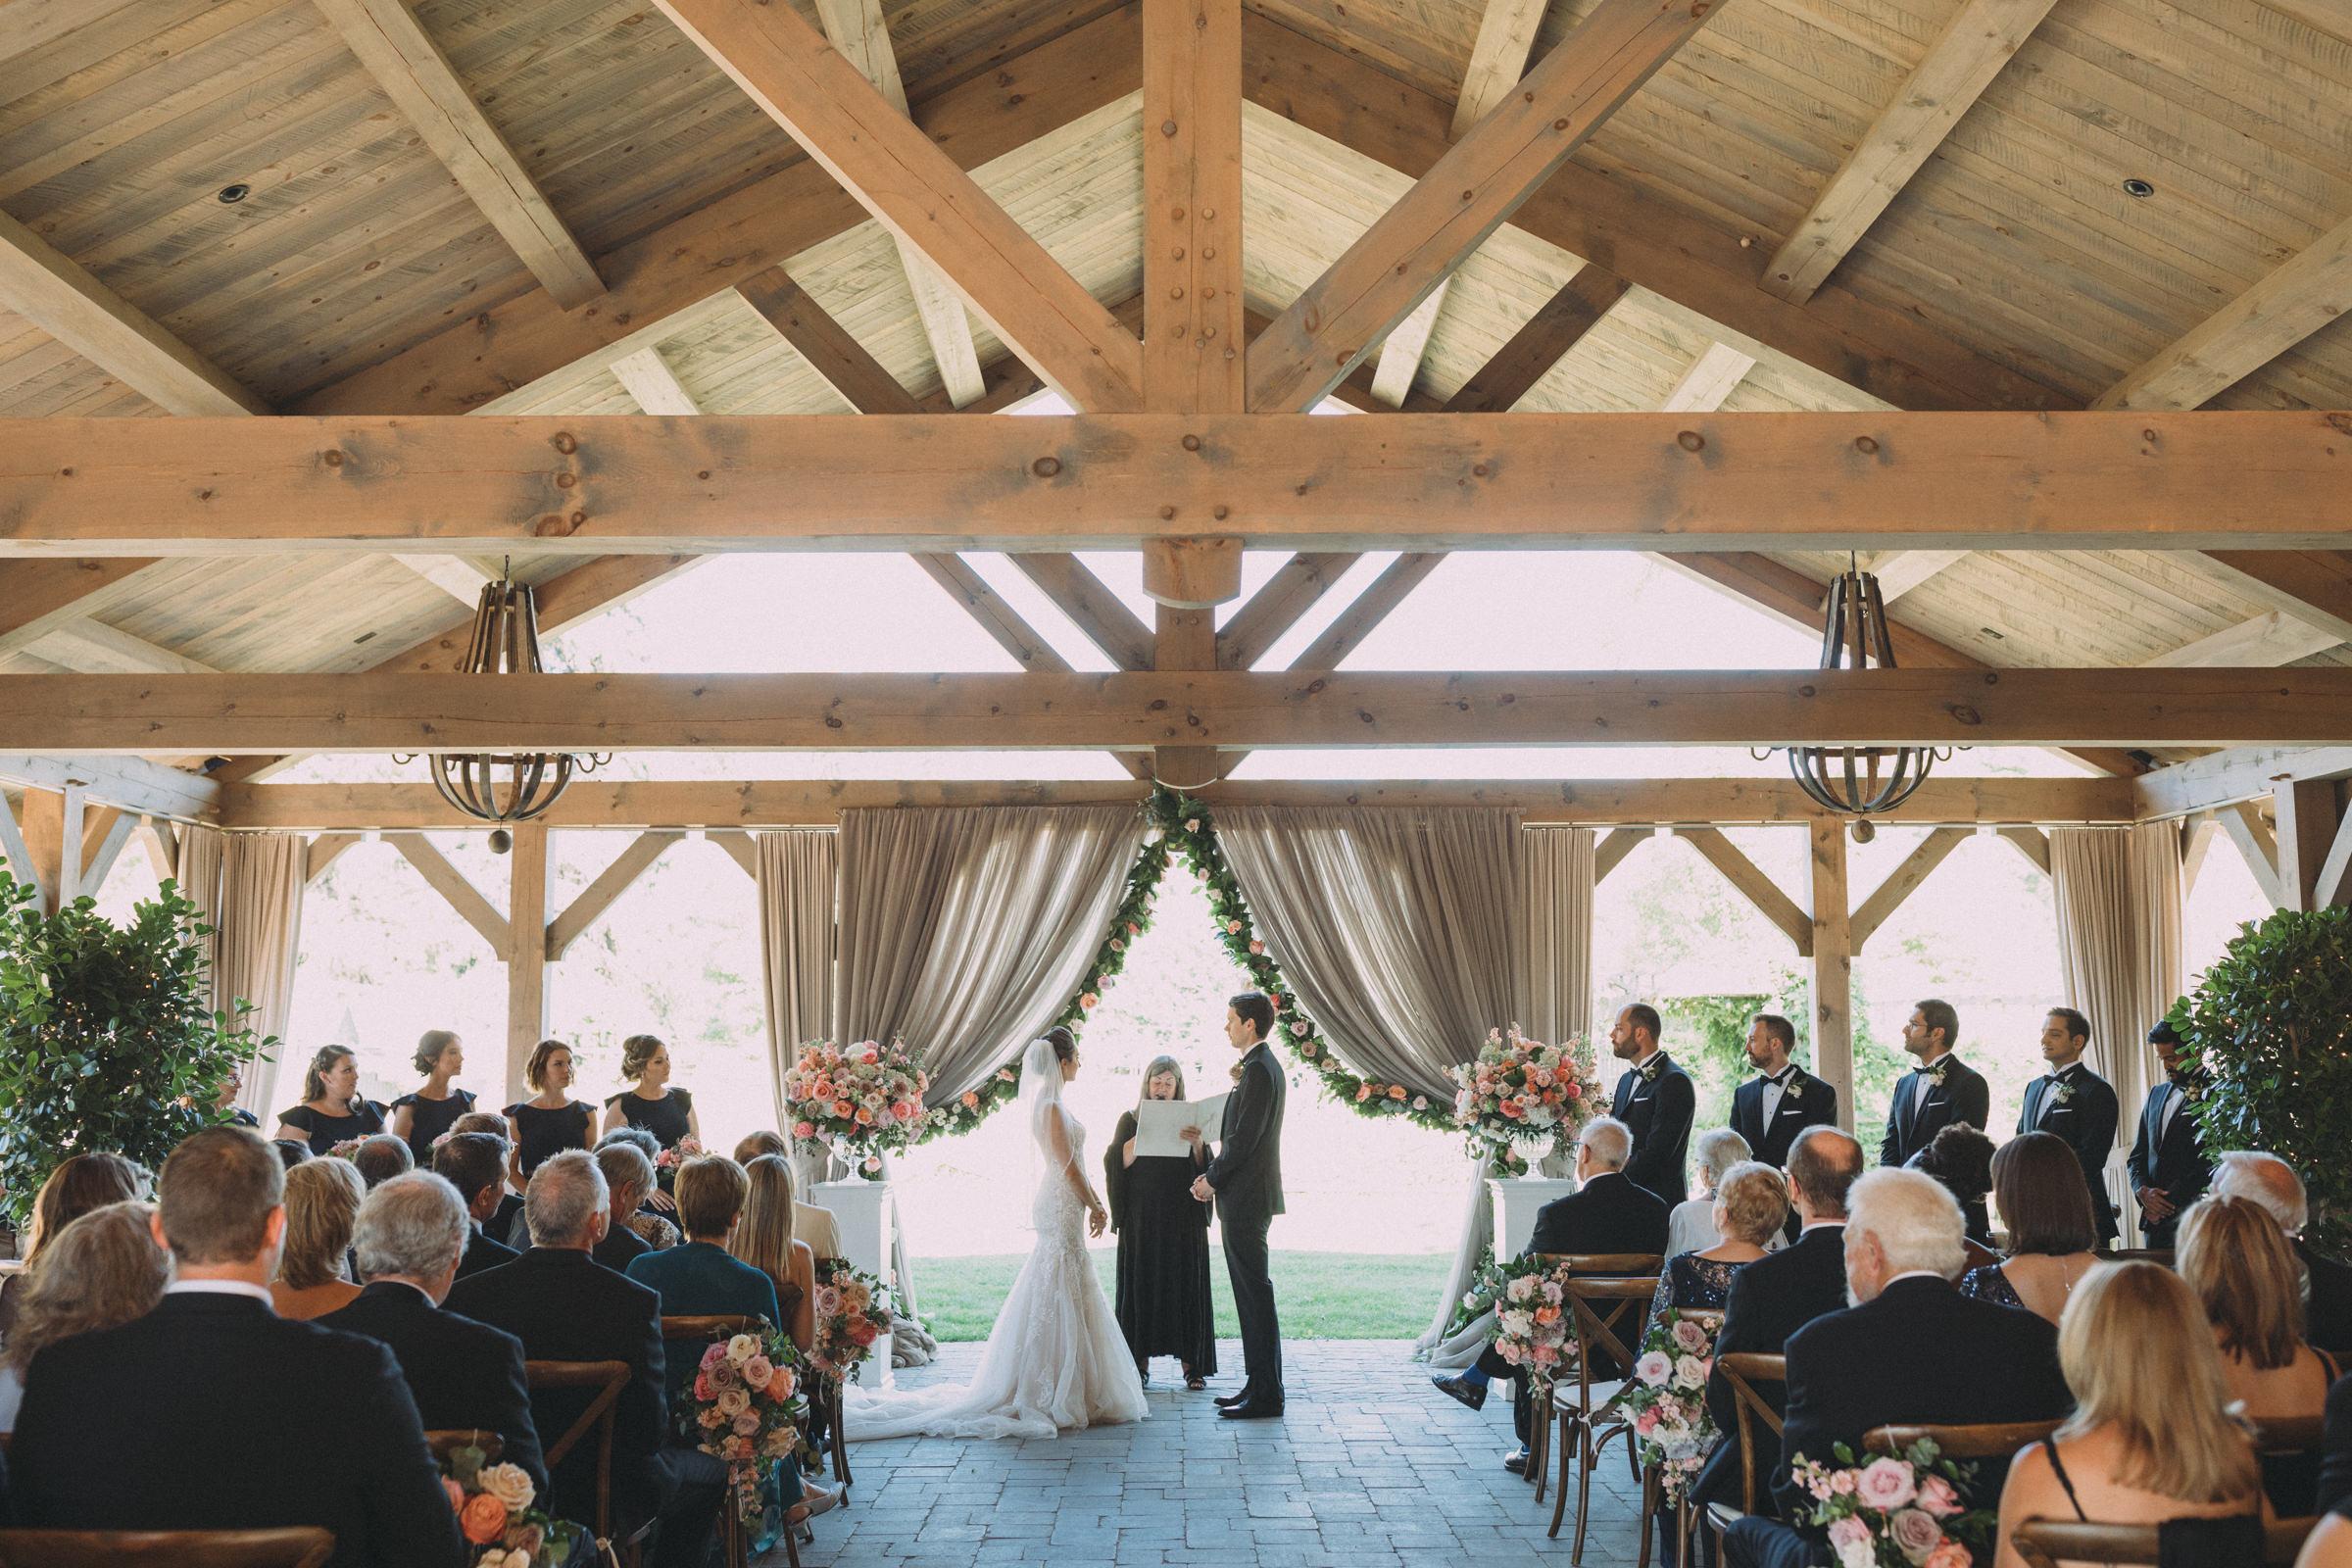 Langdon-Hall-wedding-photography-Cambridge-by-Sam-Wong-of-Visual-Cravings_Sarah-Ryan_37.jpg